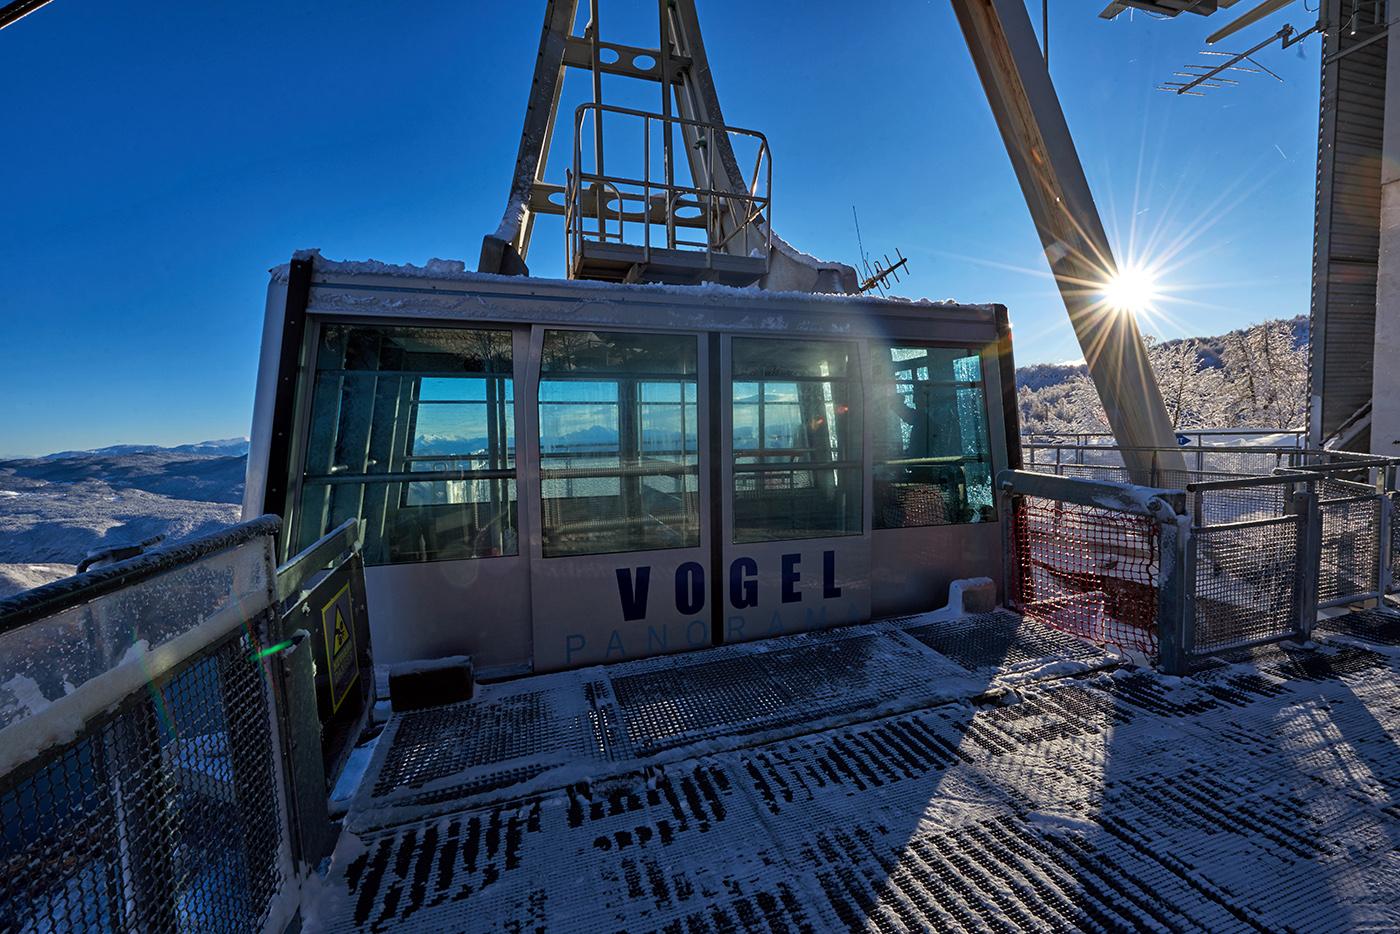 Vogel-kabinos-felvono